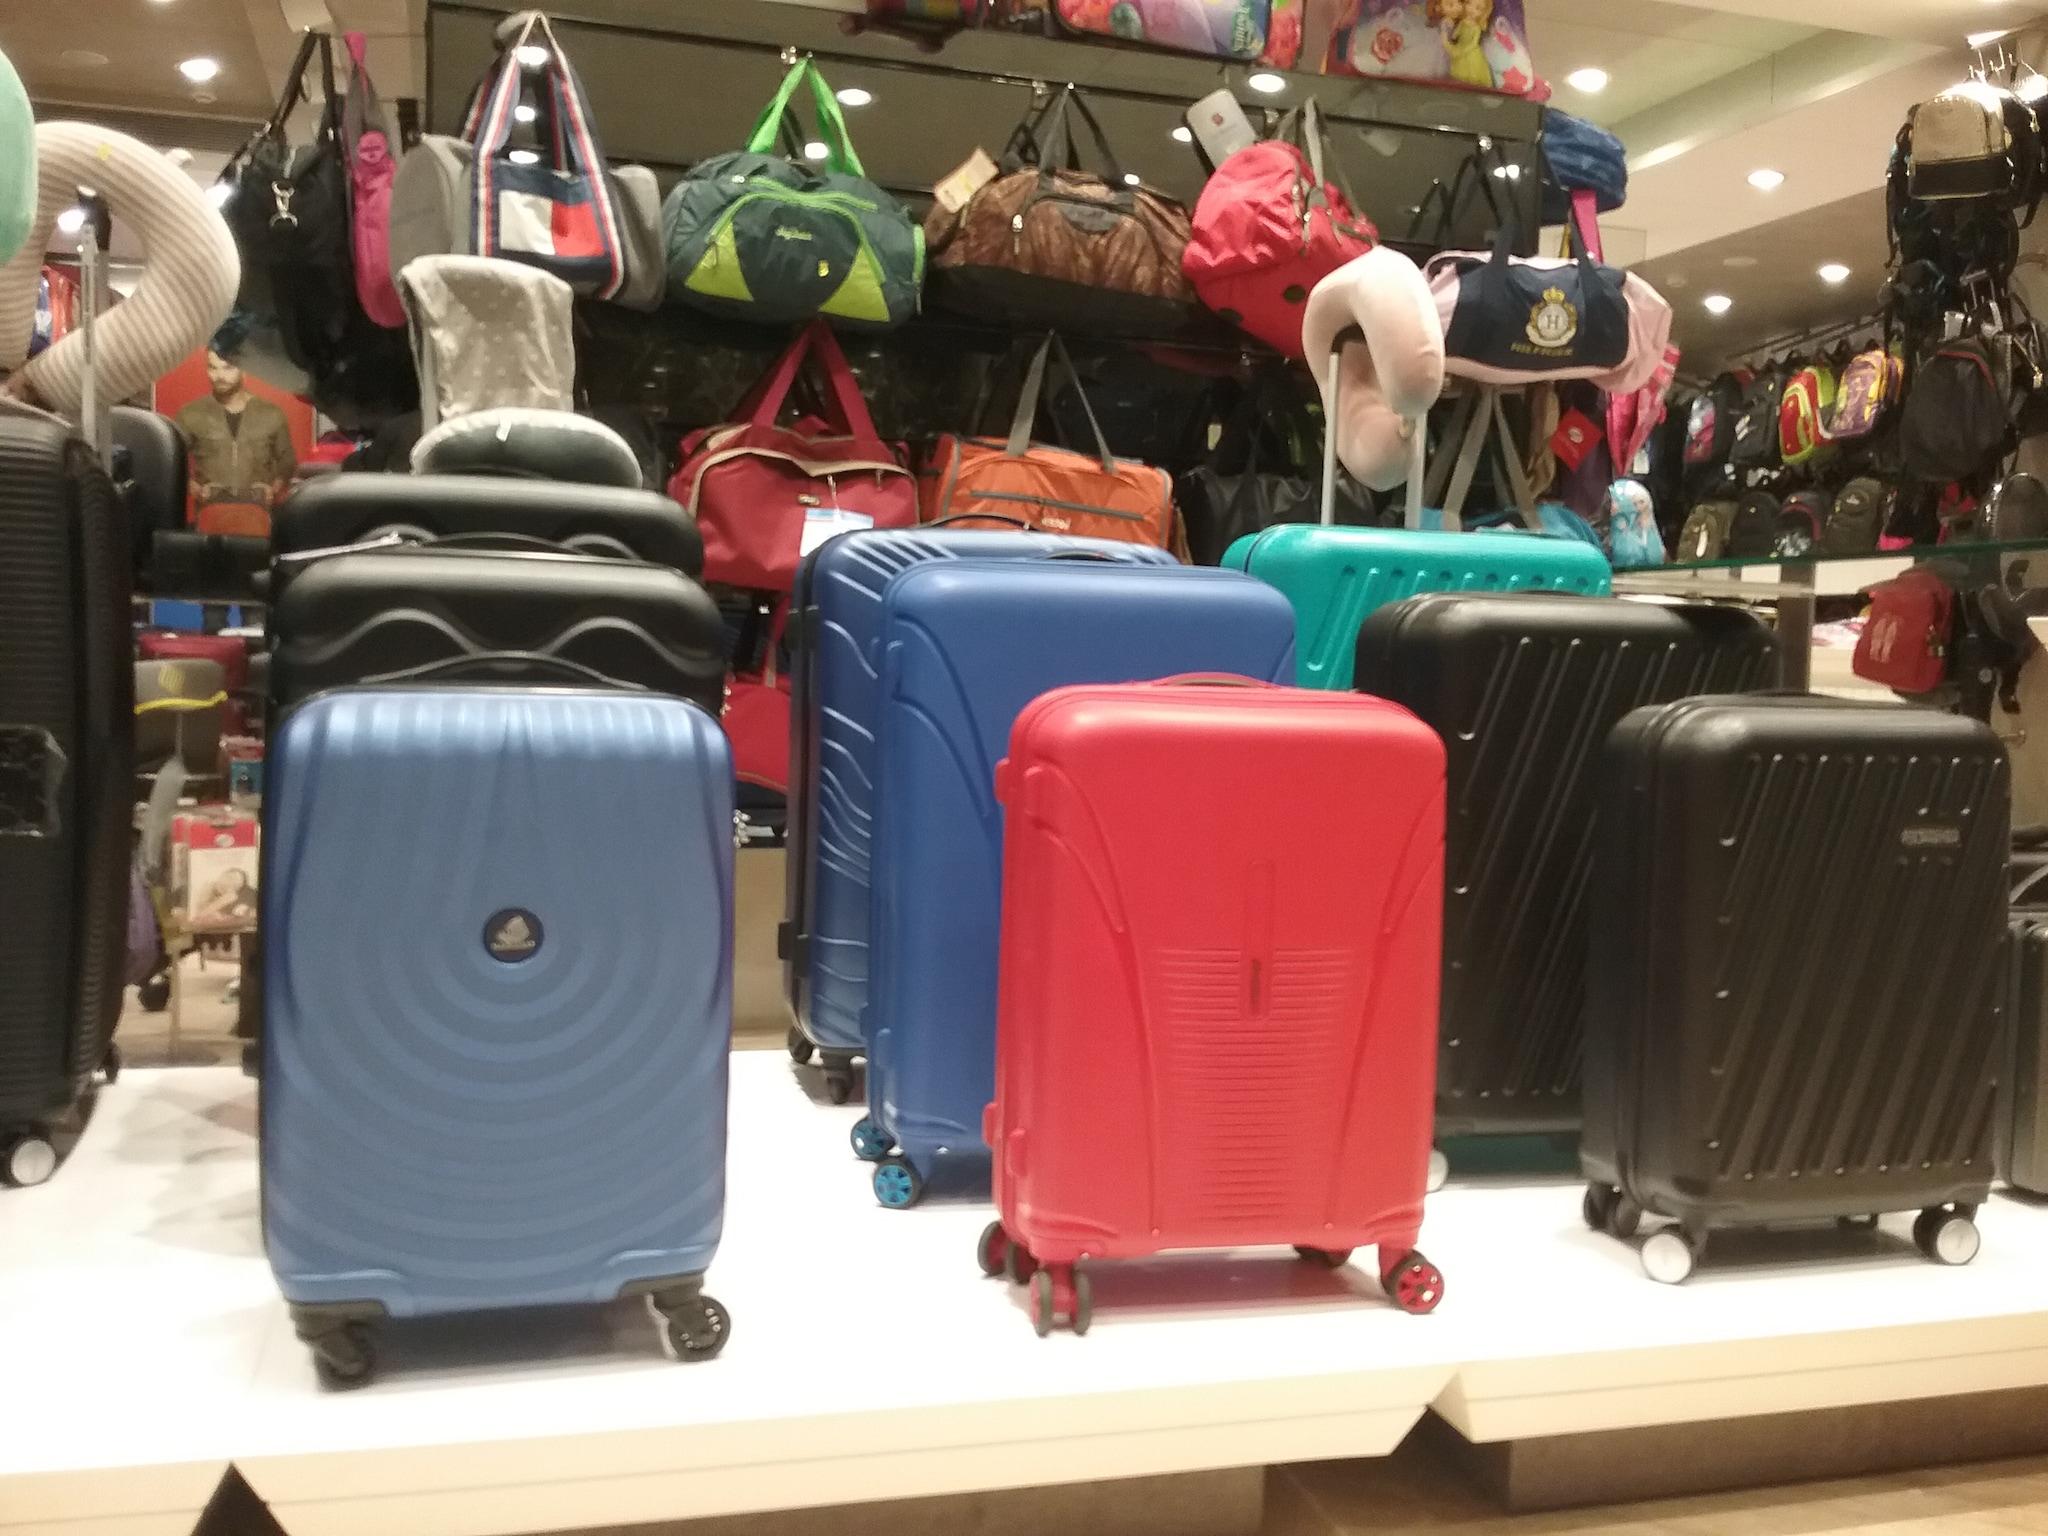 Top 100 Bag Dealers in Vadodara - Best Bag Retailers - Justdial 554de99dab9f4